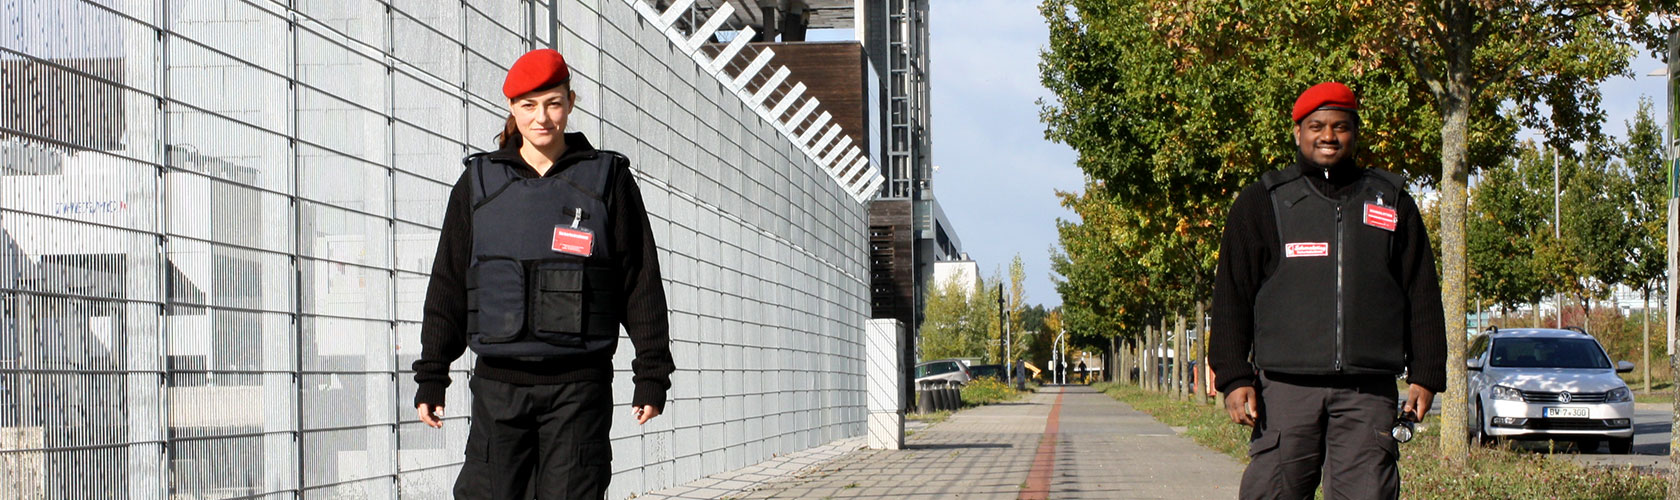 Objektschutz Security Hannover am Objekt - Rundgang um das Objekt